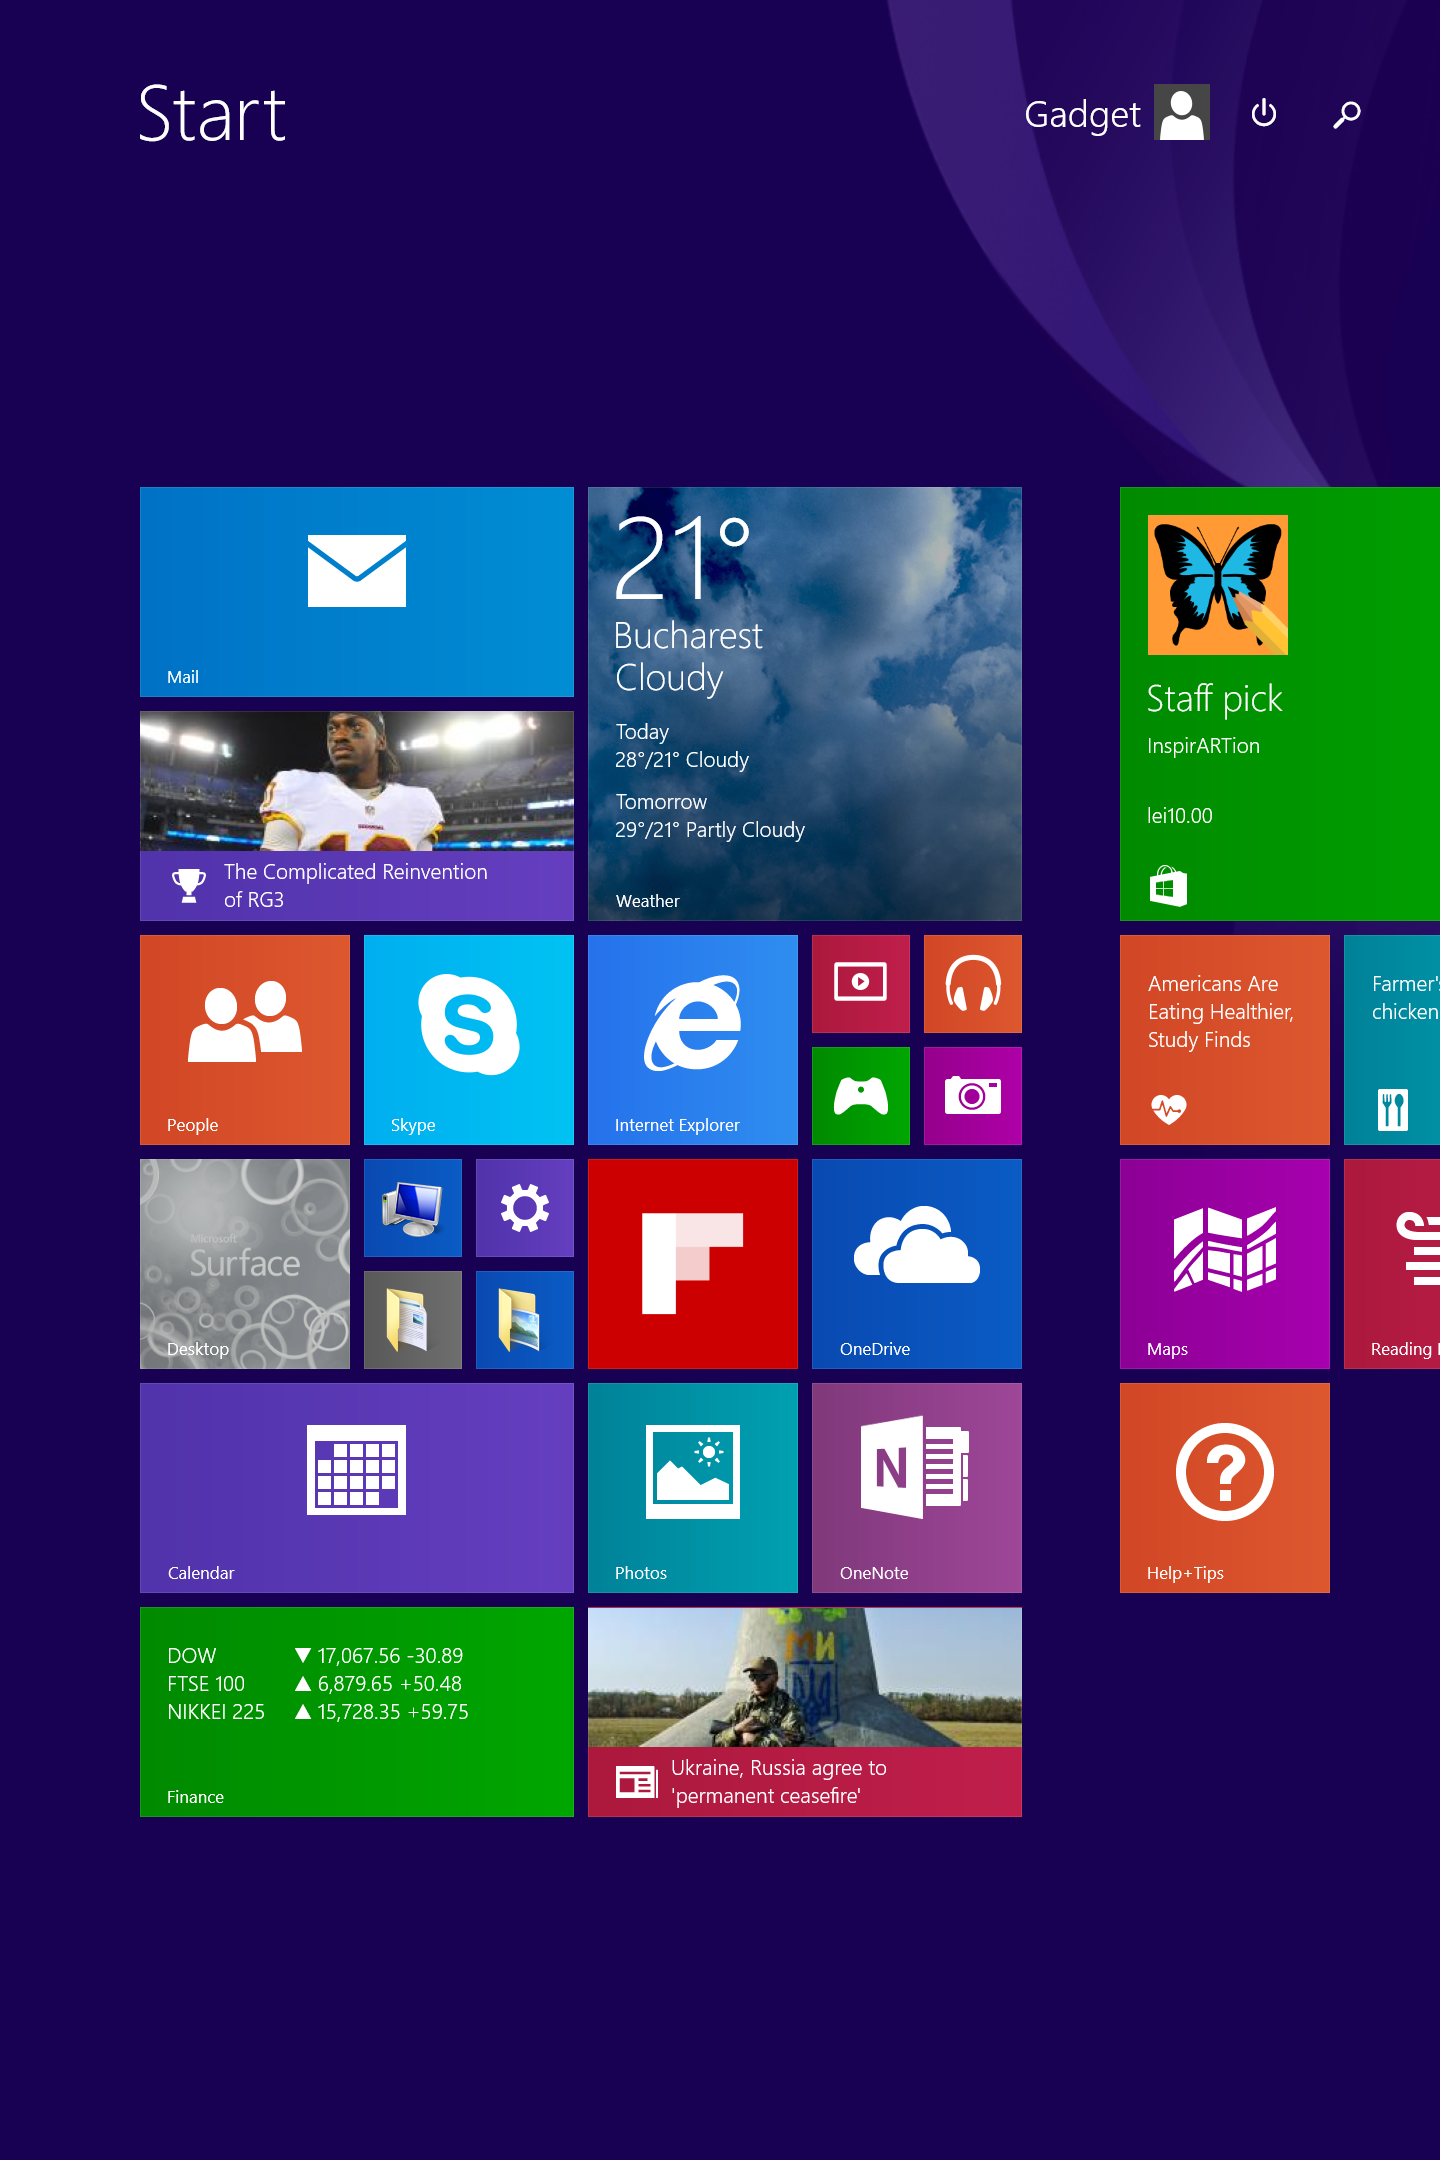 how to take screenshot on windows surface pro 3